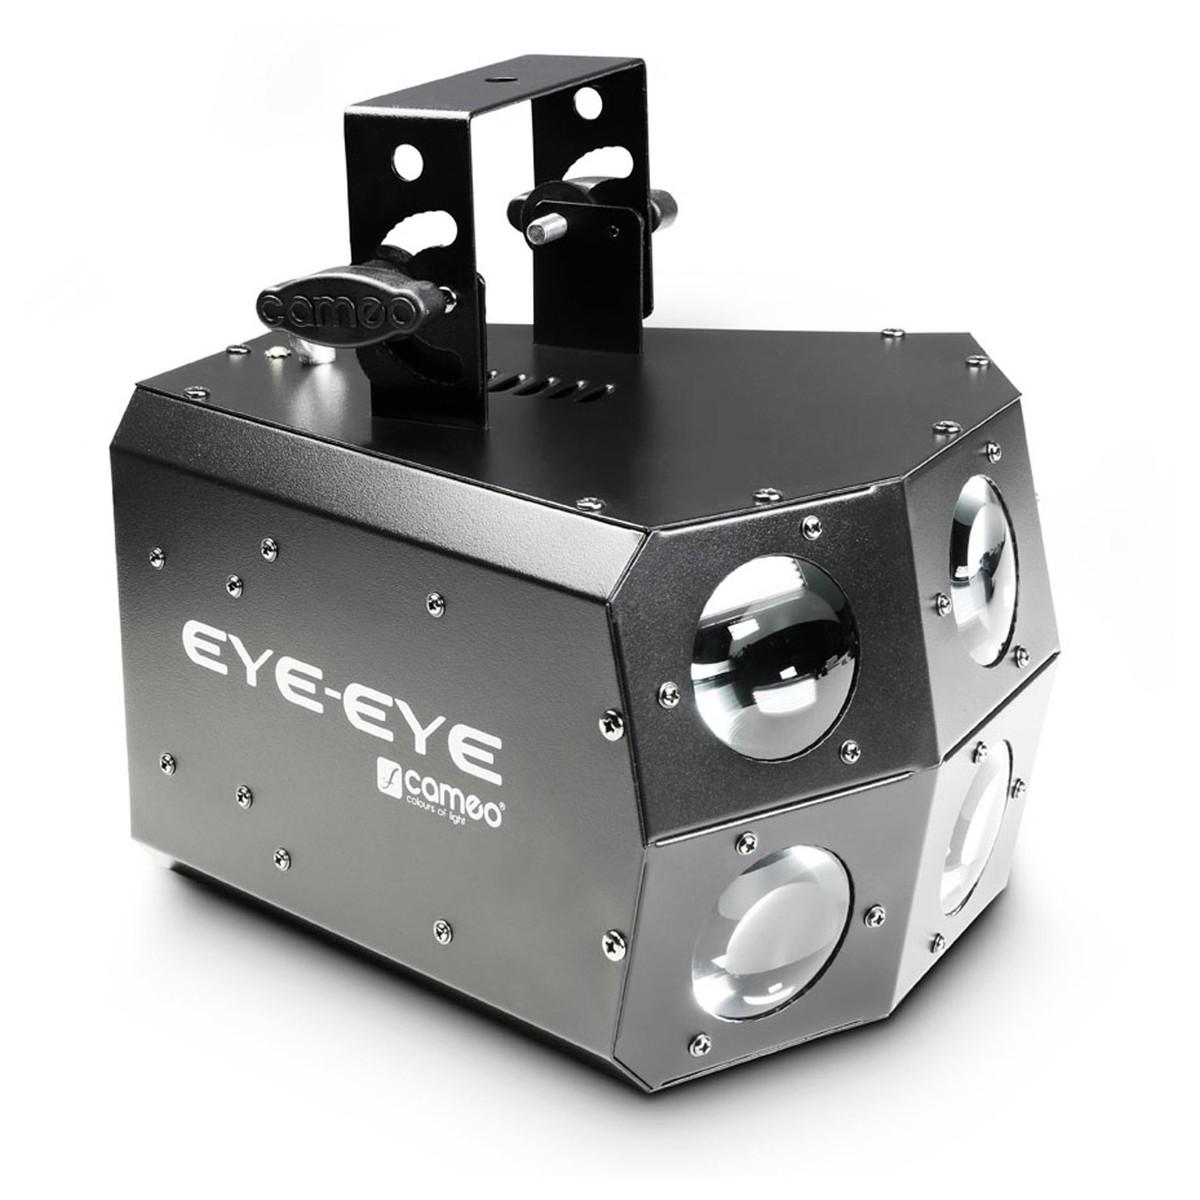 Cameo Eye Eye Derby Matrix Beam Led Lighting Effect At